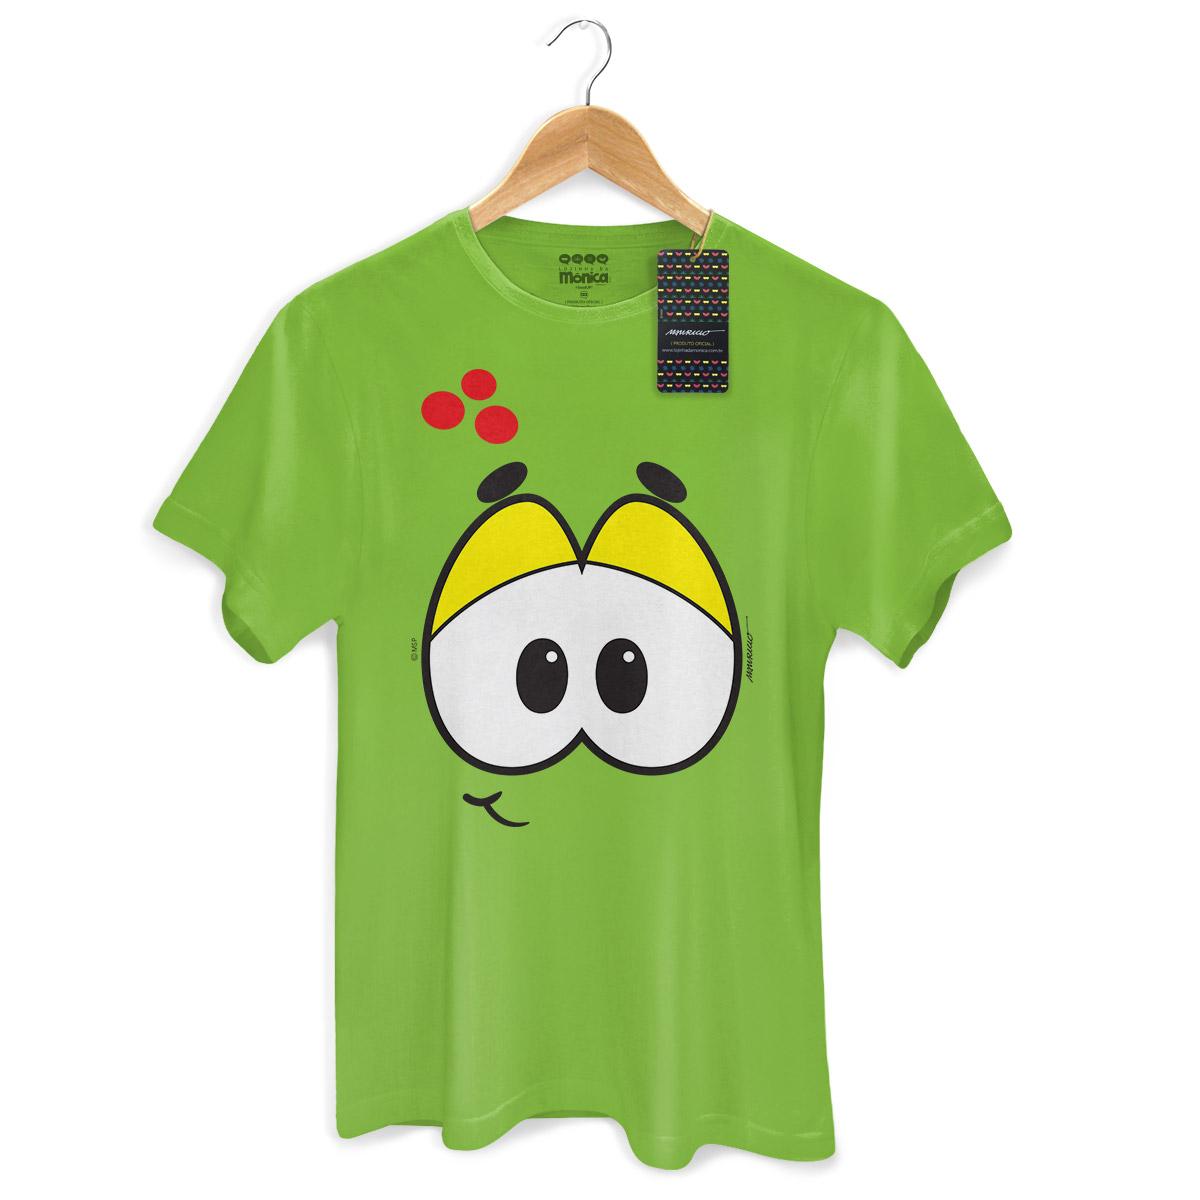 Camiseta Masculina Turma da M�nica Kids Olh�es Hor�cio